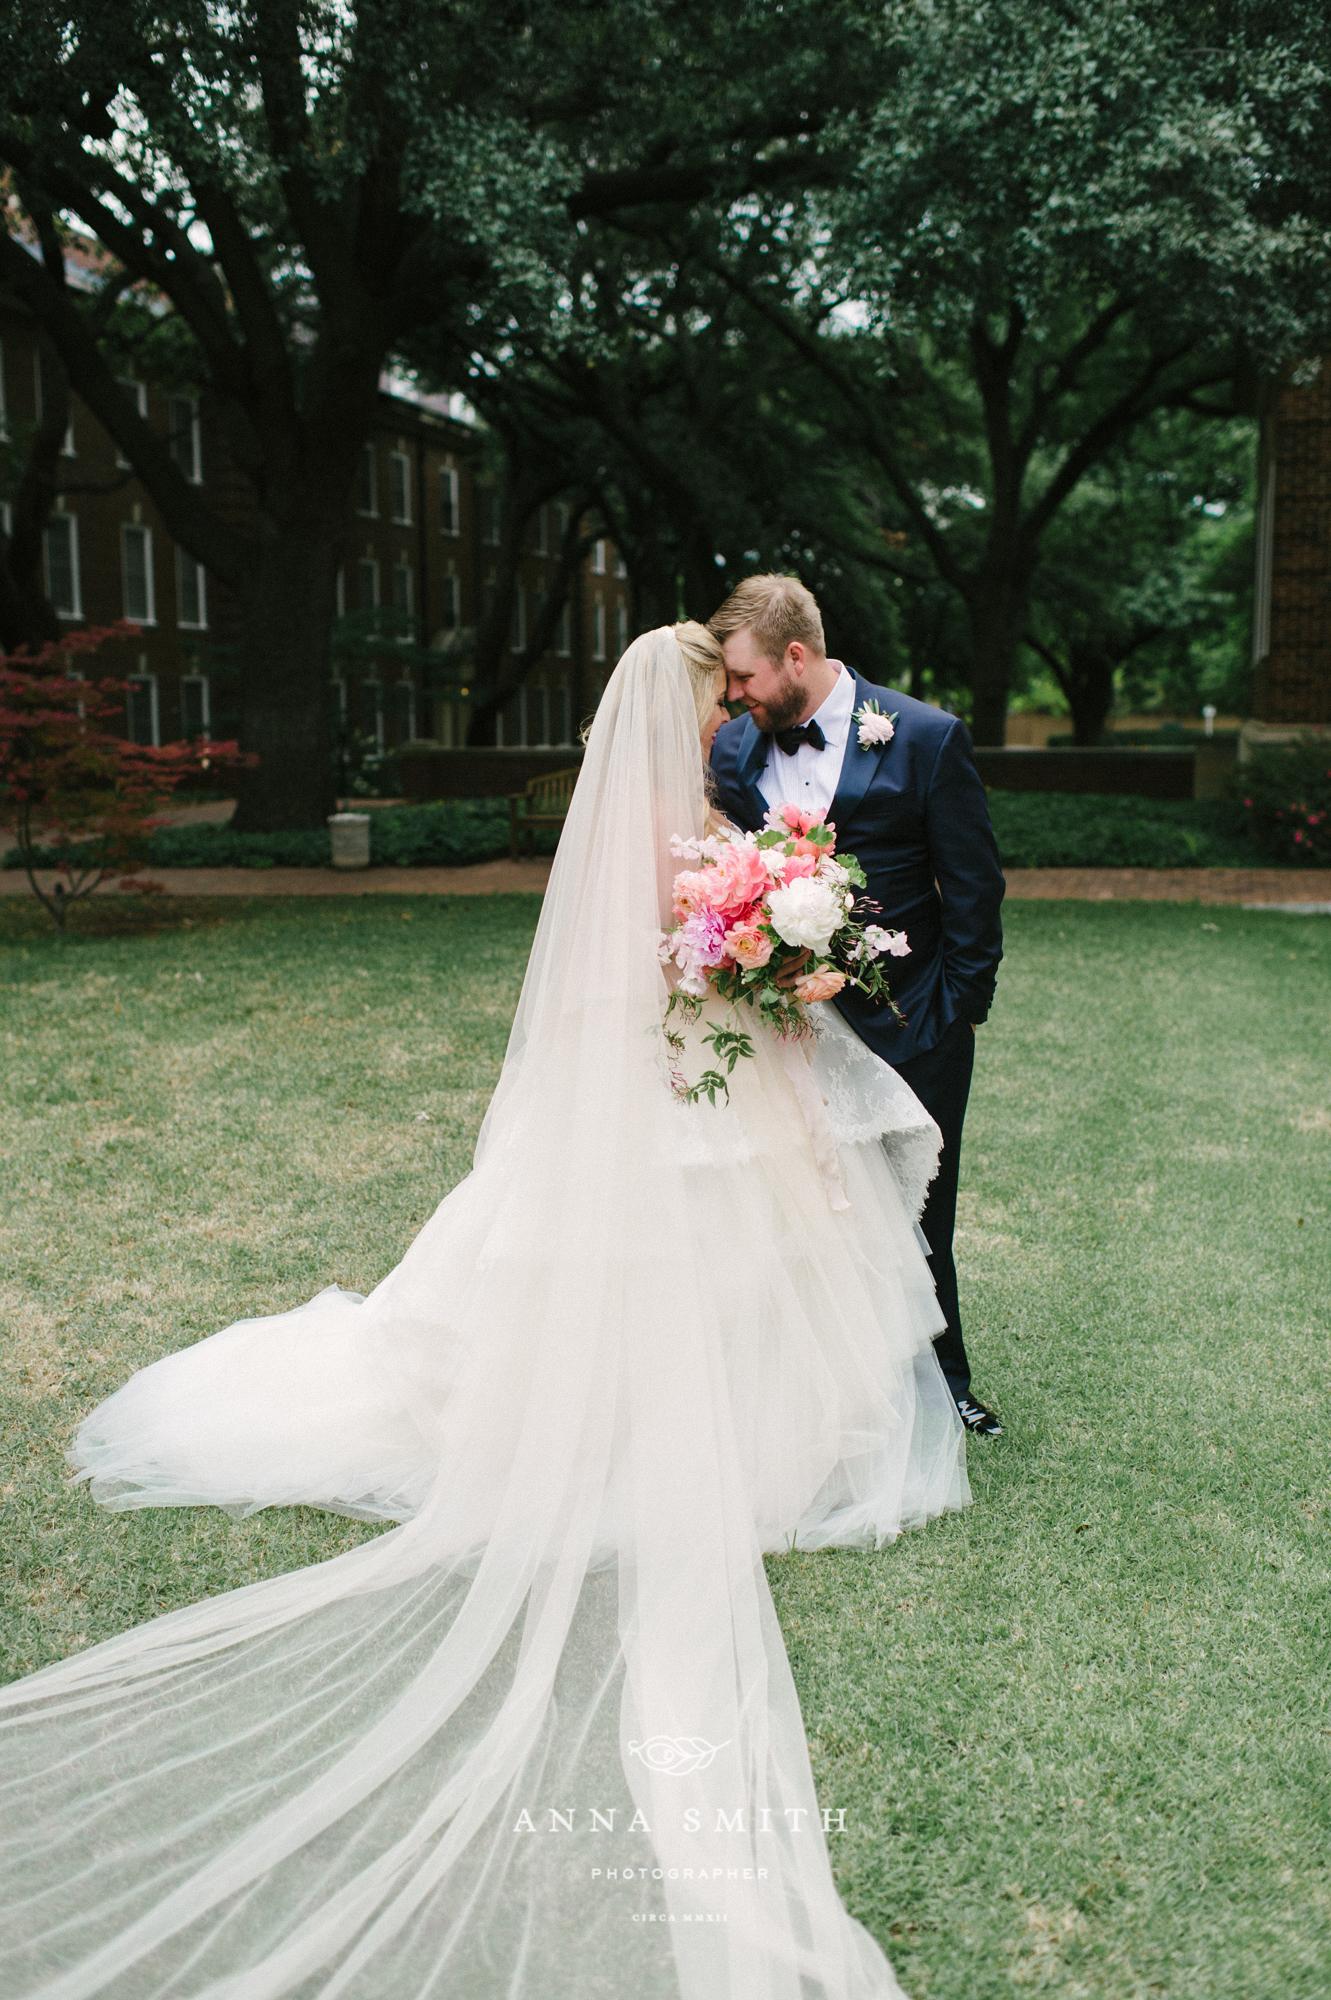 web 17- 4-W-CD-heather brandon wedding perkins adolphus-738.jpg